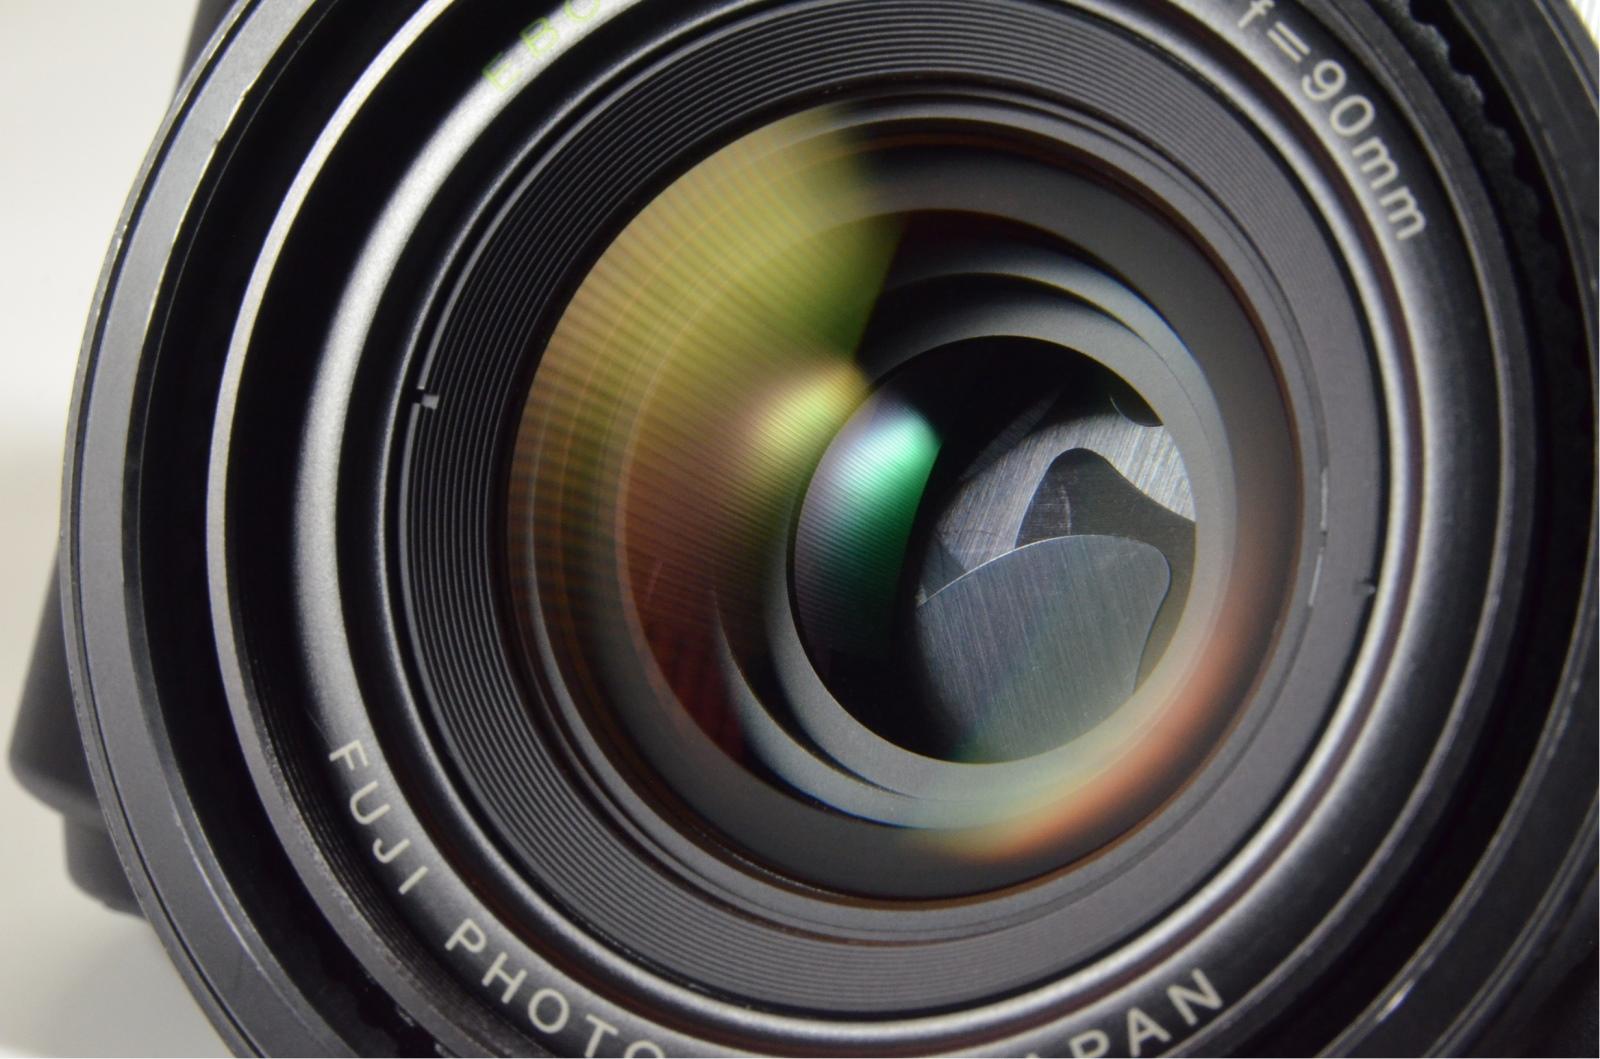 fuji fujifilm gw690iii 90mm f3.5 medium format count only '067' rare!